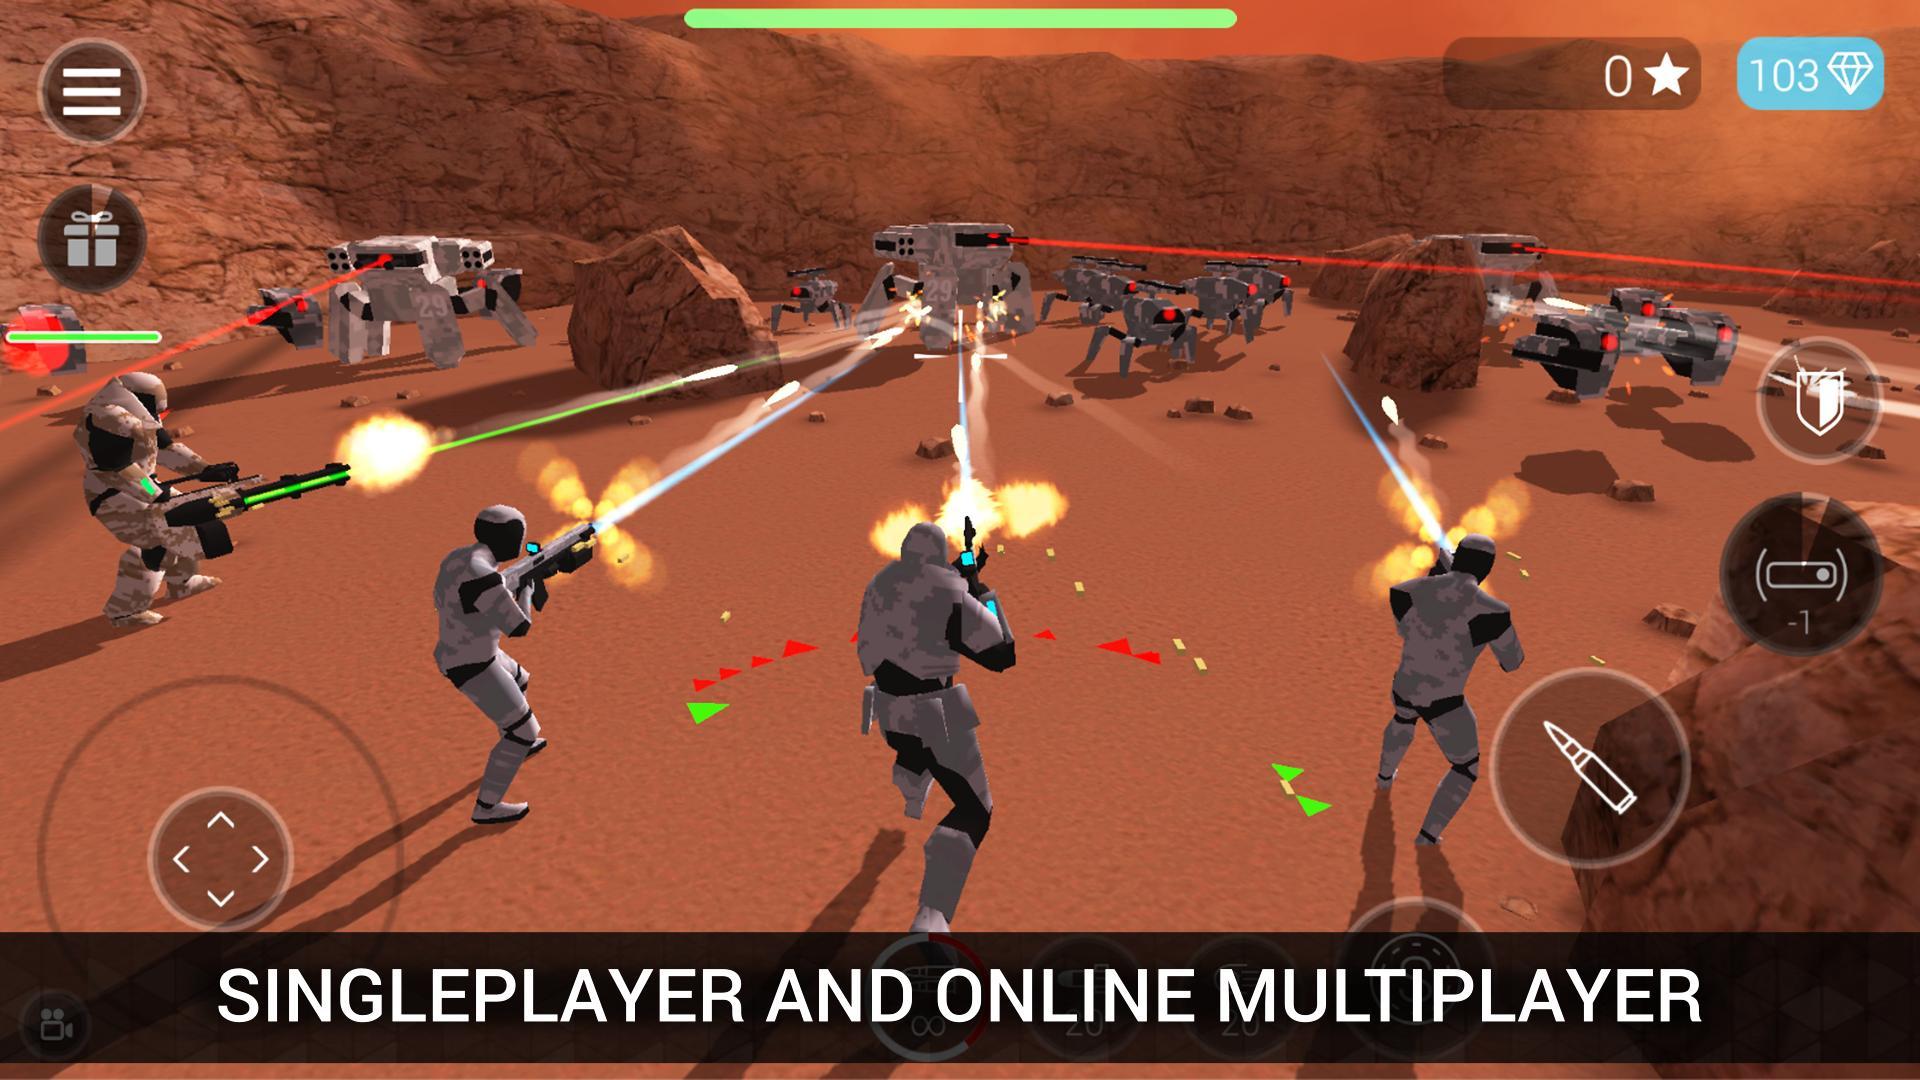 CyberSphere: TPS Online Action-Shooting Game 2.09.64 Screenshot 1